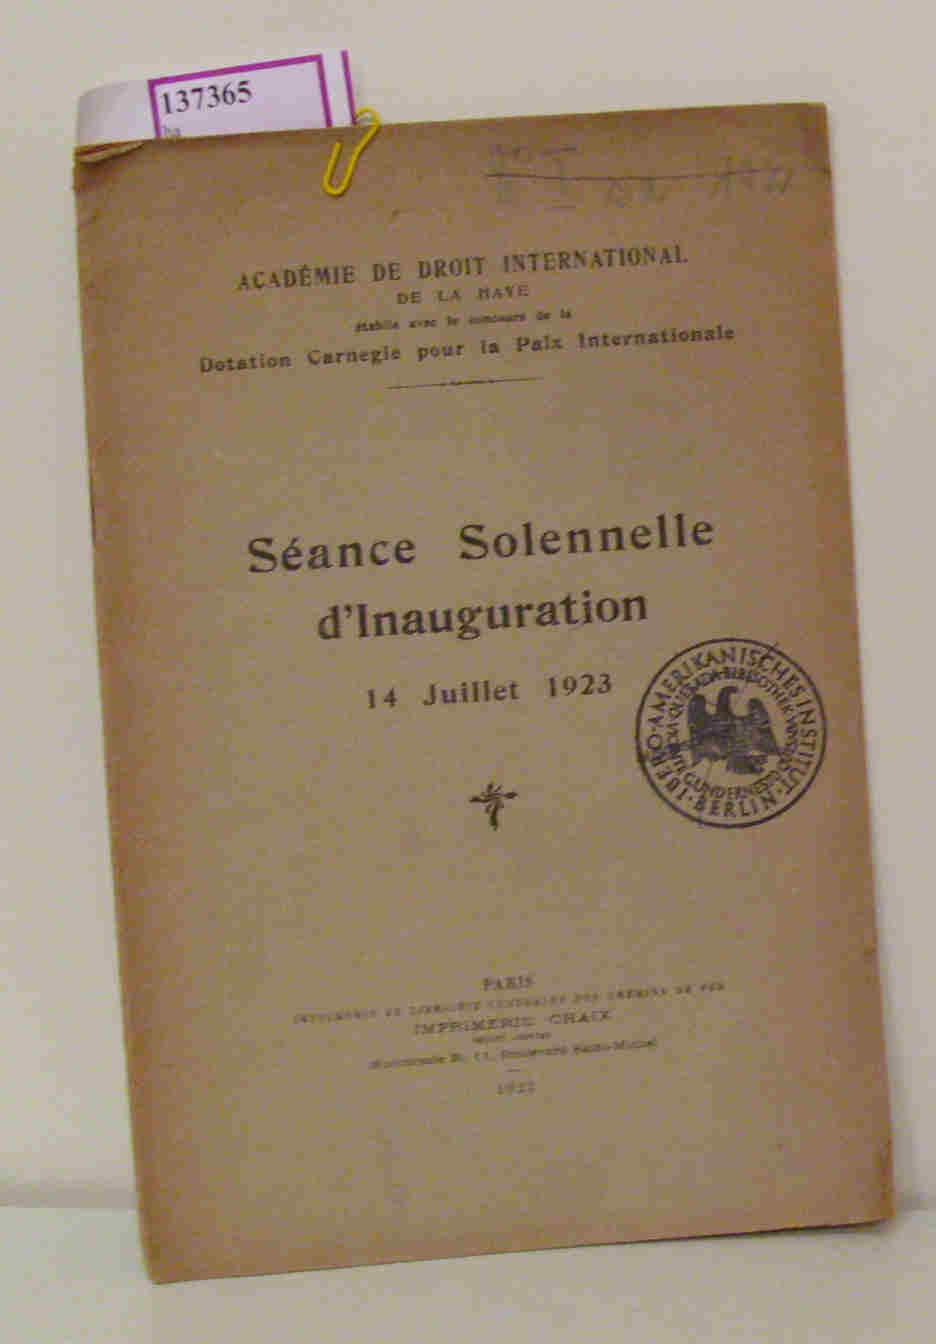 Seance Solennelle d Inauguration 14 Julliet 1923.